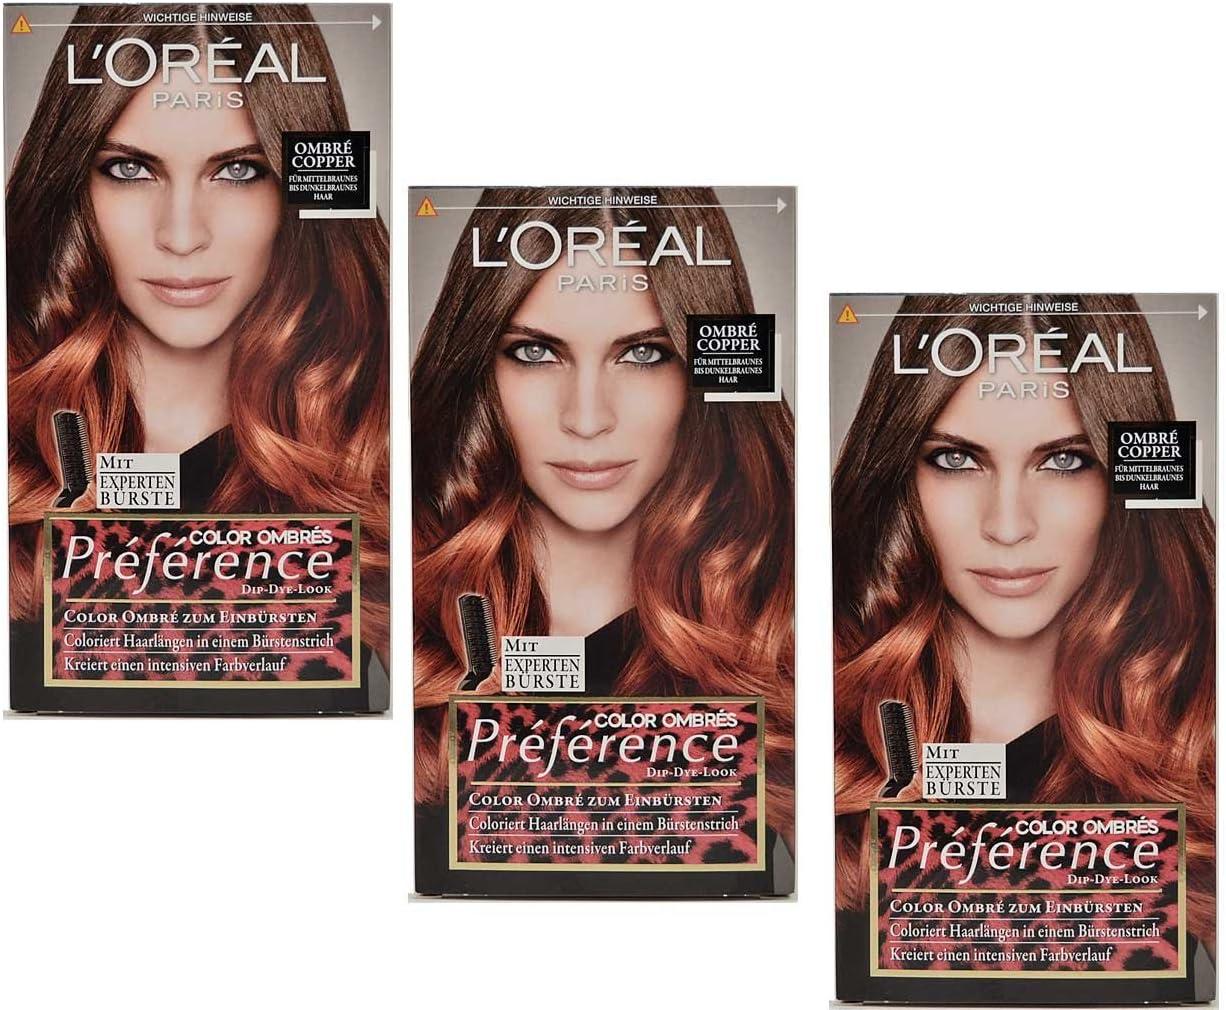 Loreal Preference Ombre Copper para cepillar, longitud del cabello teñido, 174 ml, 3 unidades